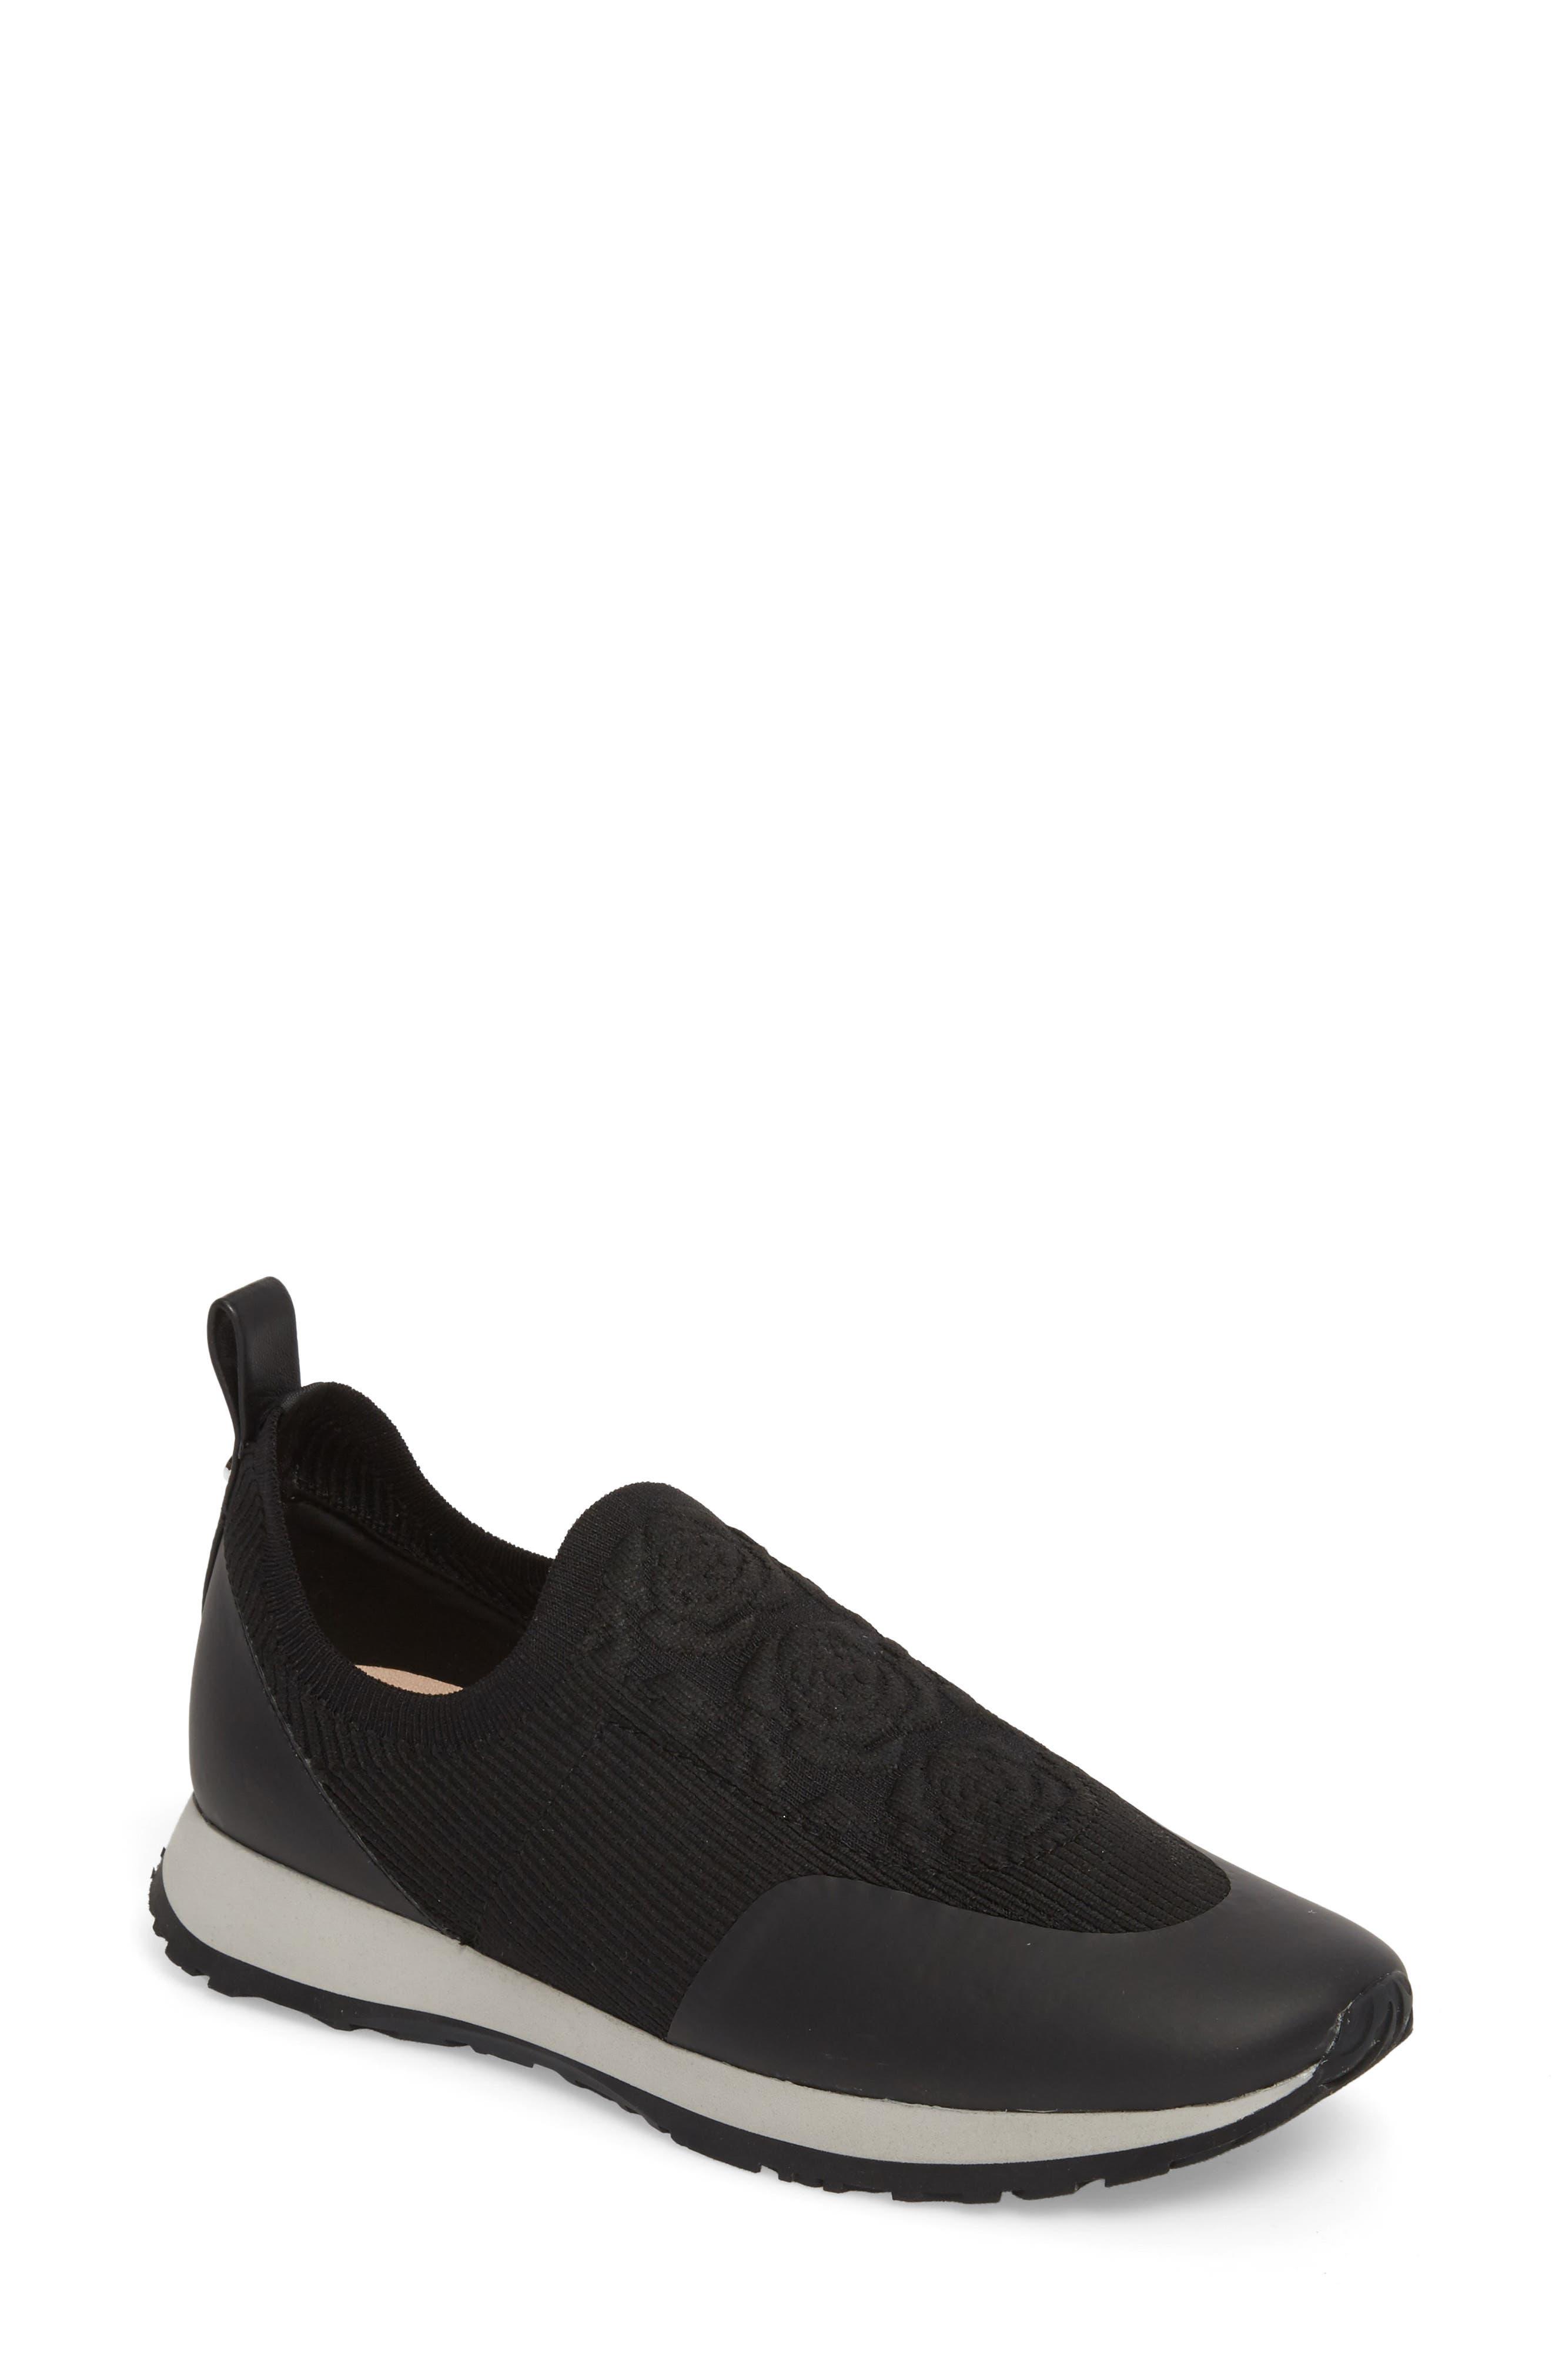 Cara Slip-On Sneaker,                             Main thumbnail 1, color,                             Black Fabric